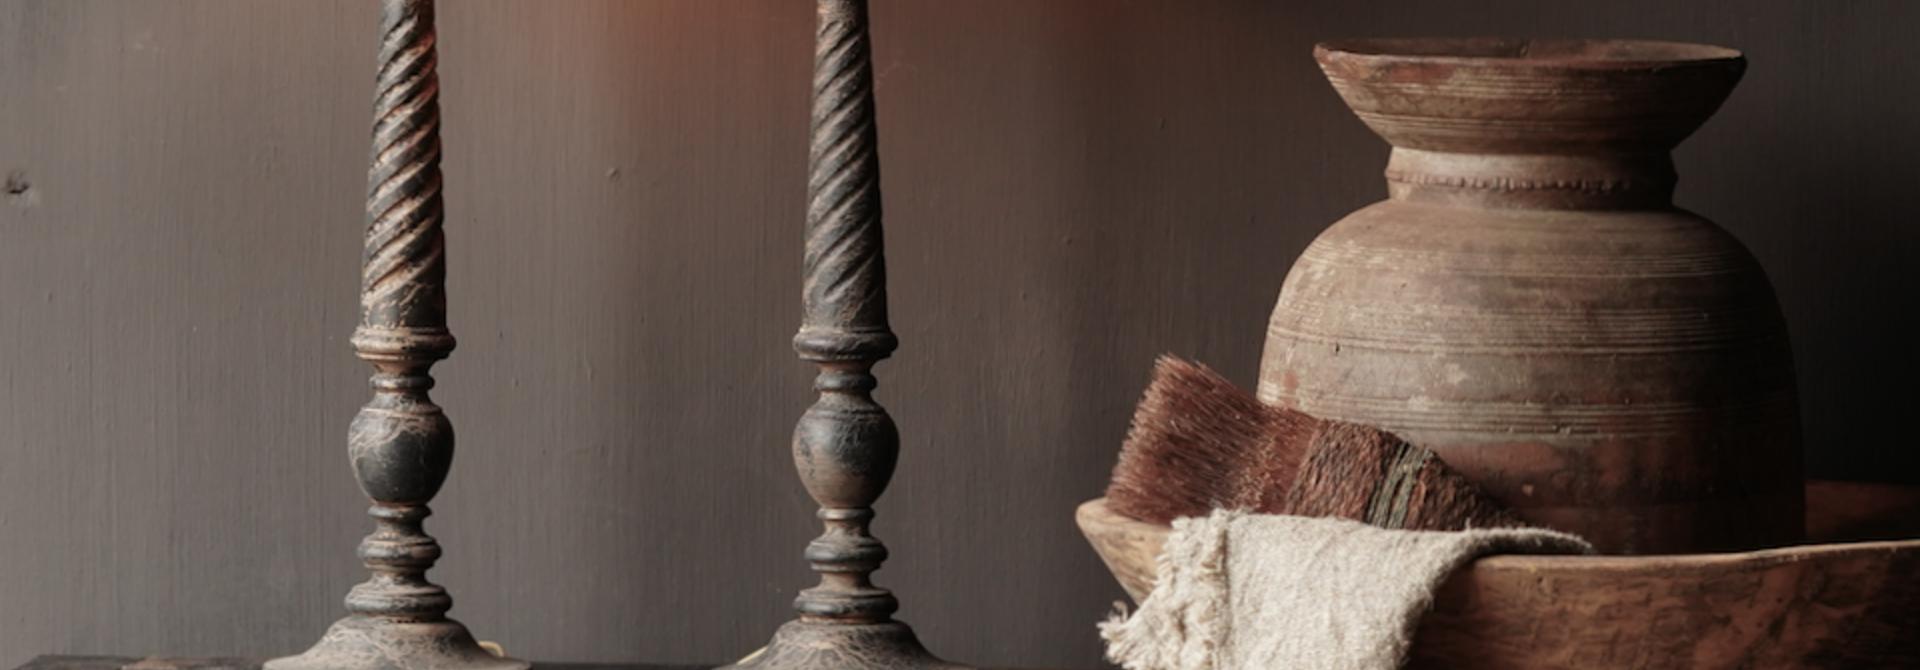 Dark Black / Brown Wooden lamp including shade